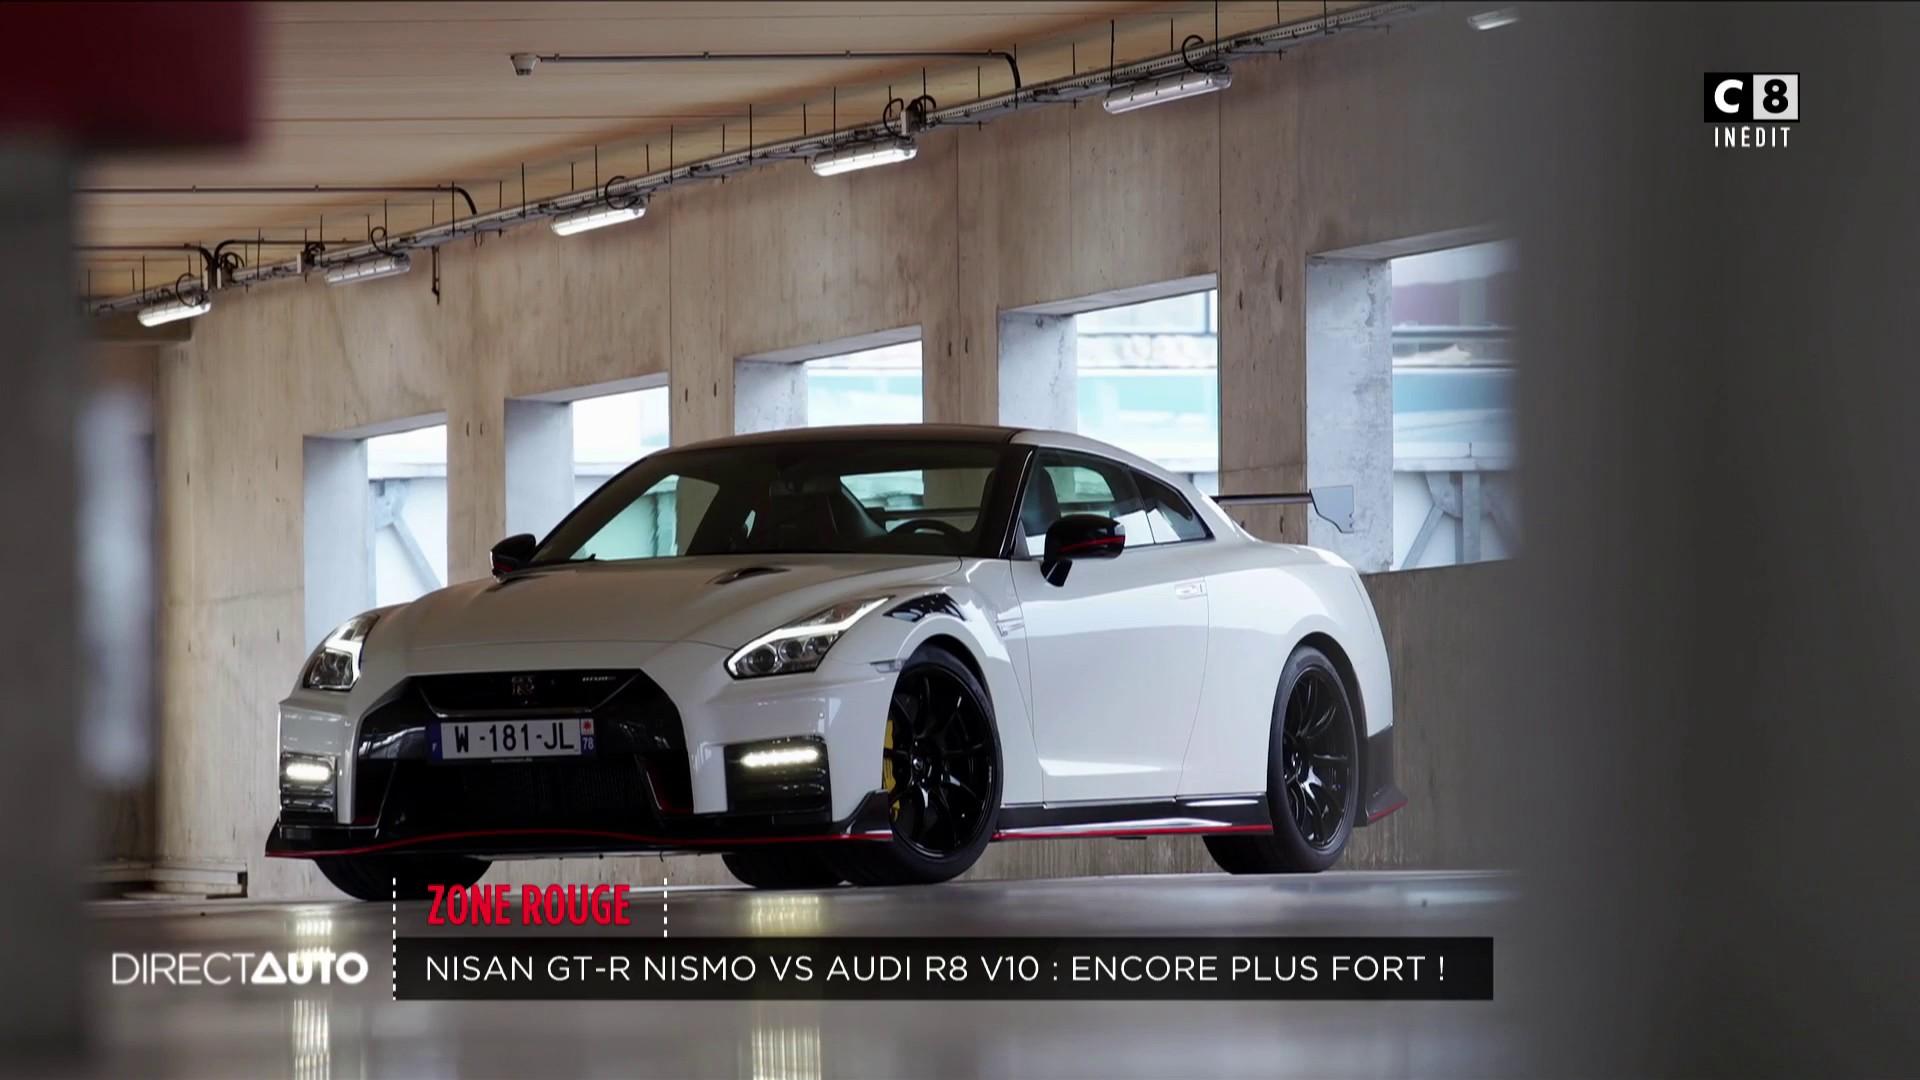 Nissan GT-R Nismo 2020 vs Audi R8 V10 : encore plus fort !